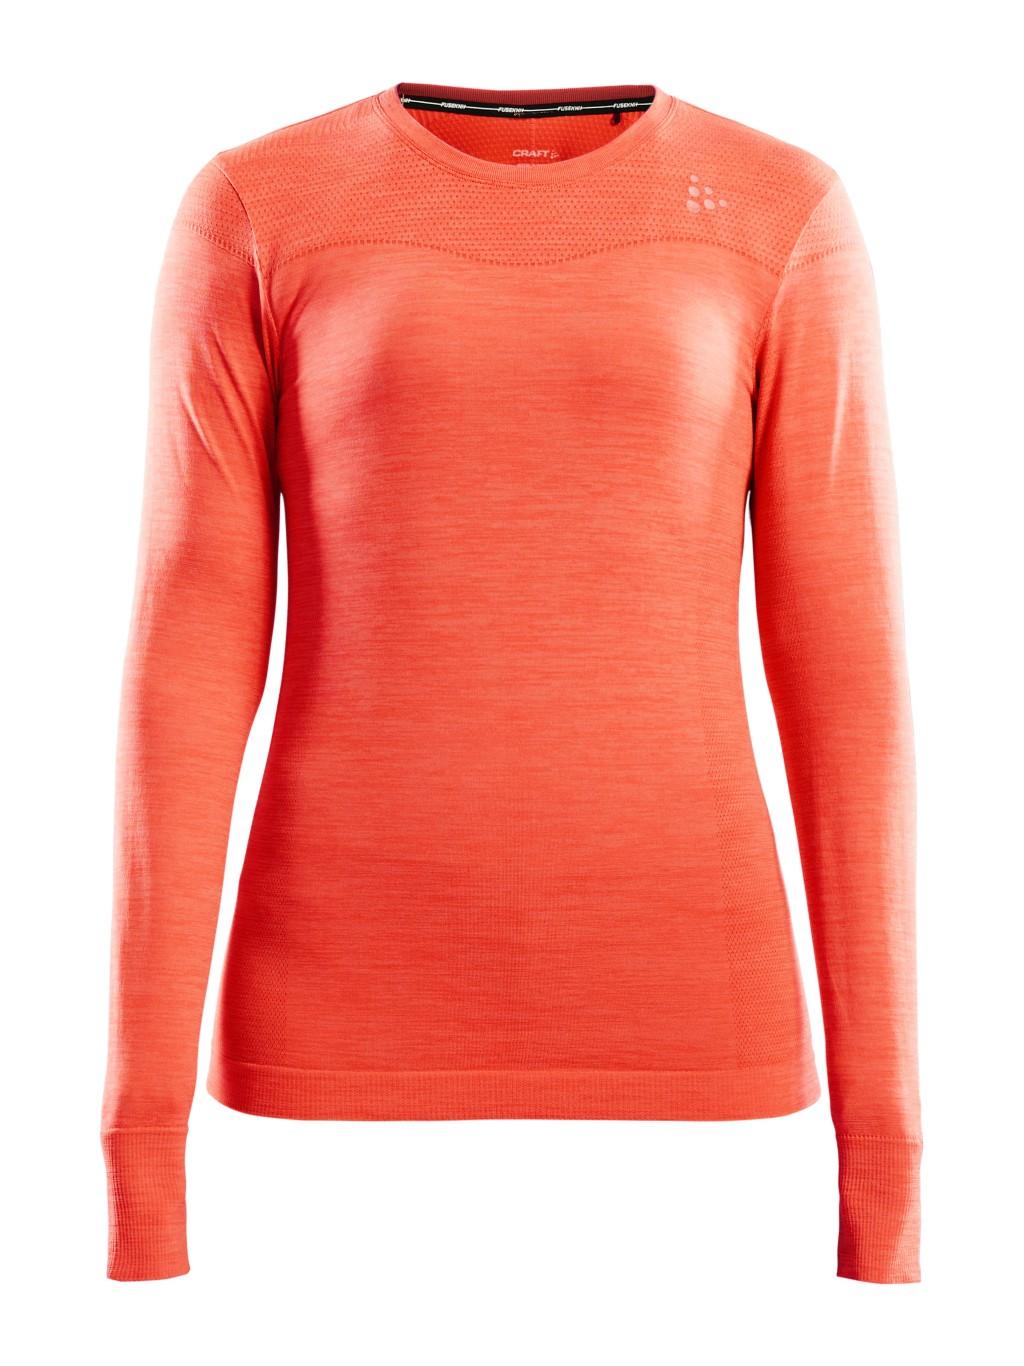 Koszulka termoaktywna damska Craft Fuseknit Comfort RN LS W Pomarañczowa